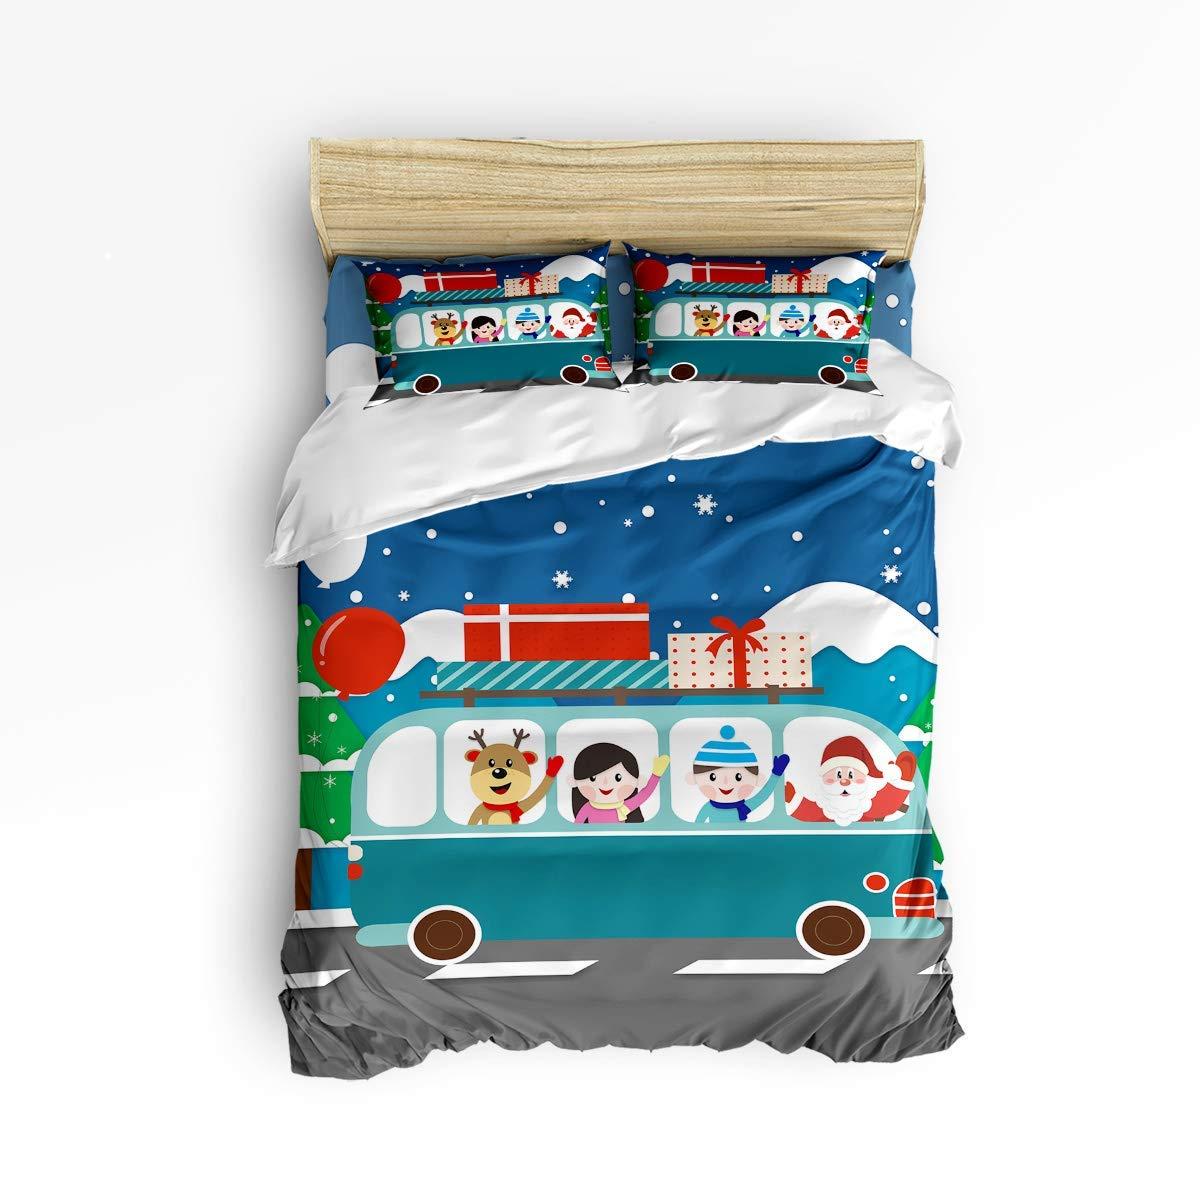 ZOMOY サンタクロースがバスに送るギフト 寝具4点セット 掛け布団カバー クリスマスシーズン 高級ソフトフラットシーツセット 装飾枕シャム付き 10代の女の子 男の子 男性 女性 子供用 クイーン LFFMARNM11210EWLYX-SWTQ01499SJTCZLH B07QHVXJPF Christmas Gift Car クイーン